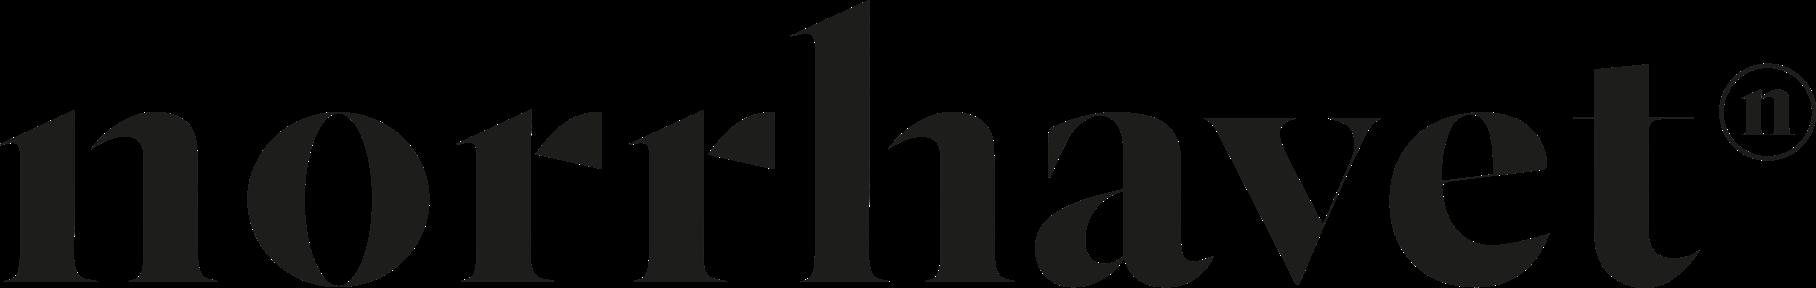 Norrhavet logo